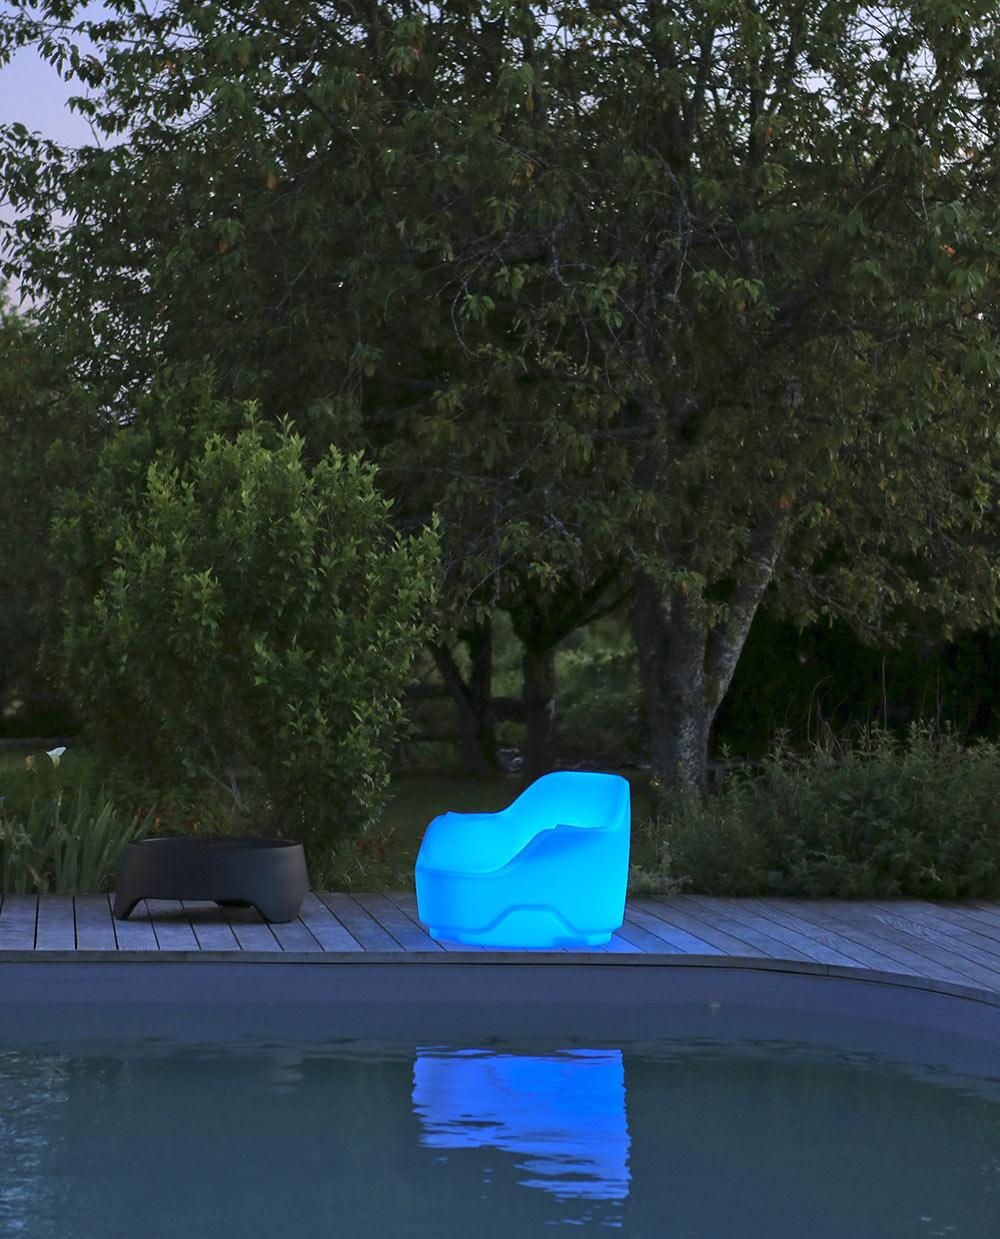 Fauteuil De Jardin Lumineux Moaïs - My Croisette intérieur Salon De Jardin Lumineux